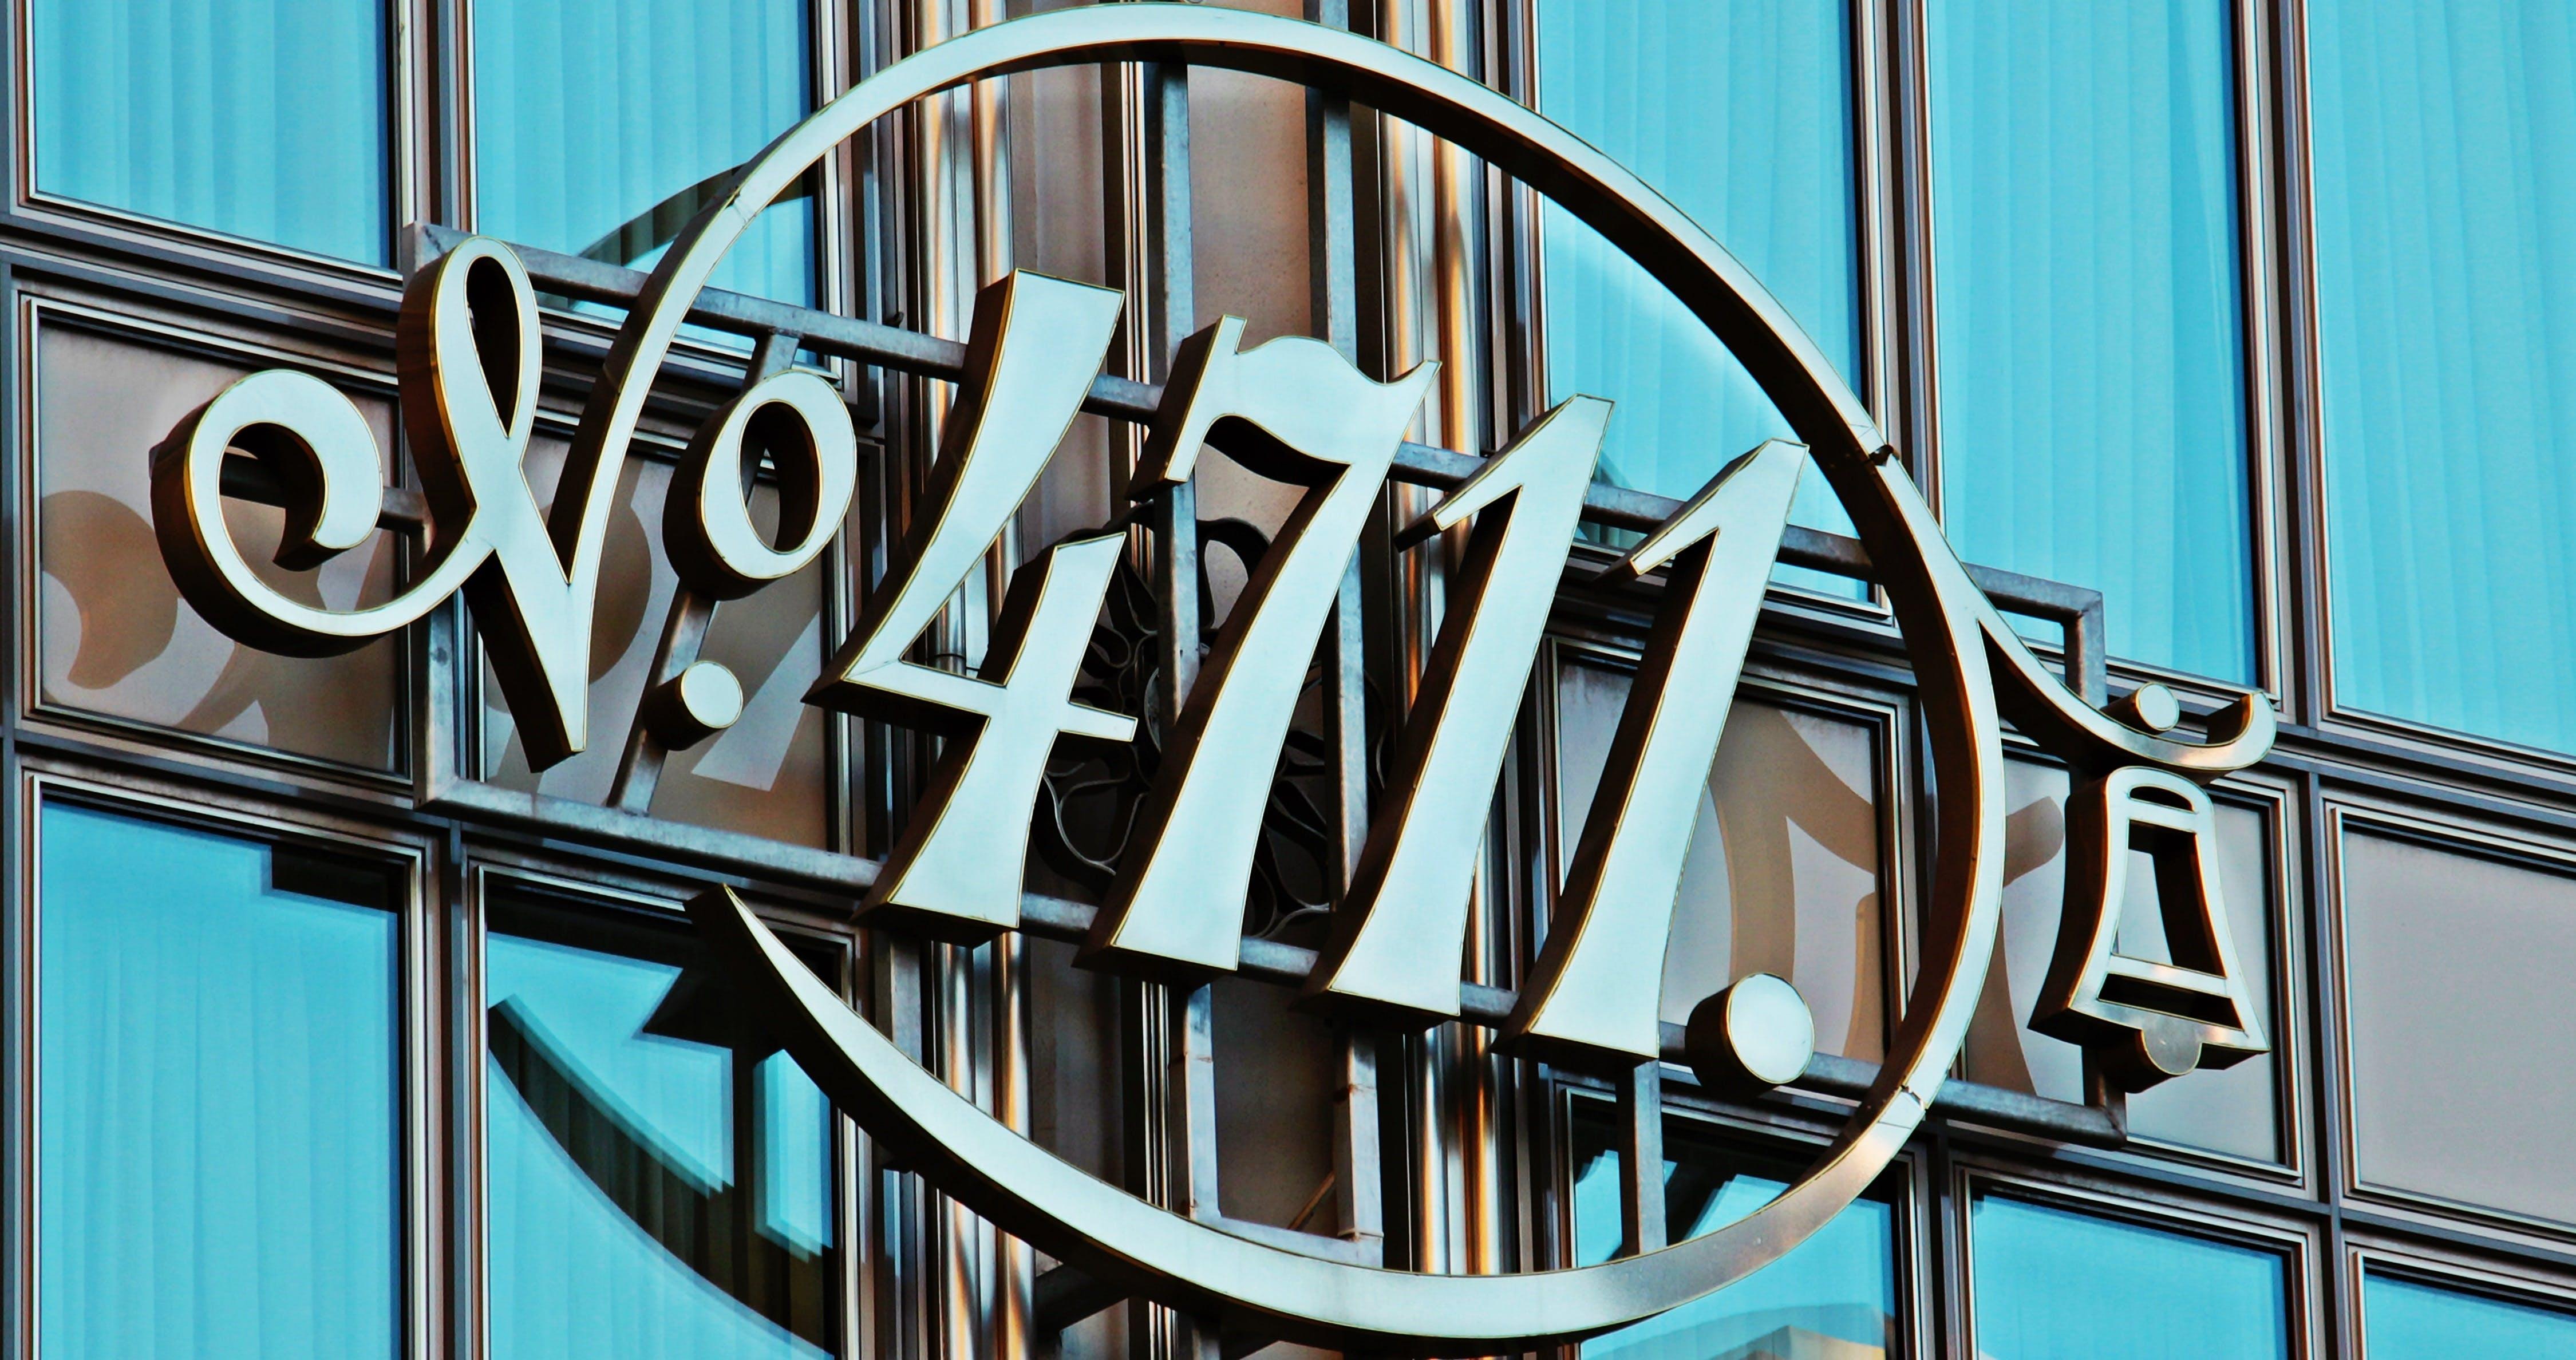 Základová fotografie zdarma na téma 4711 logo, budova, design, fasáda